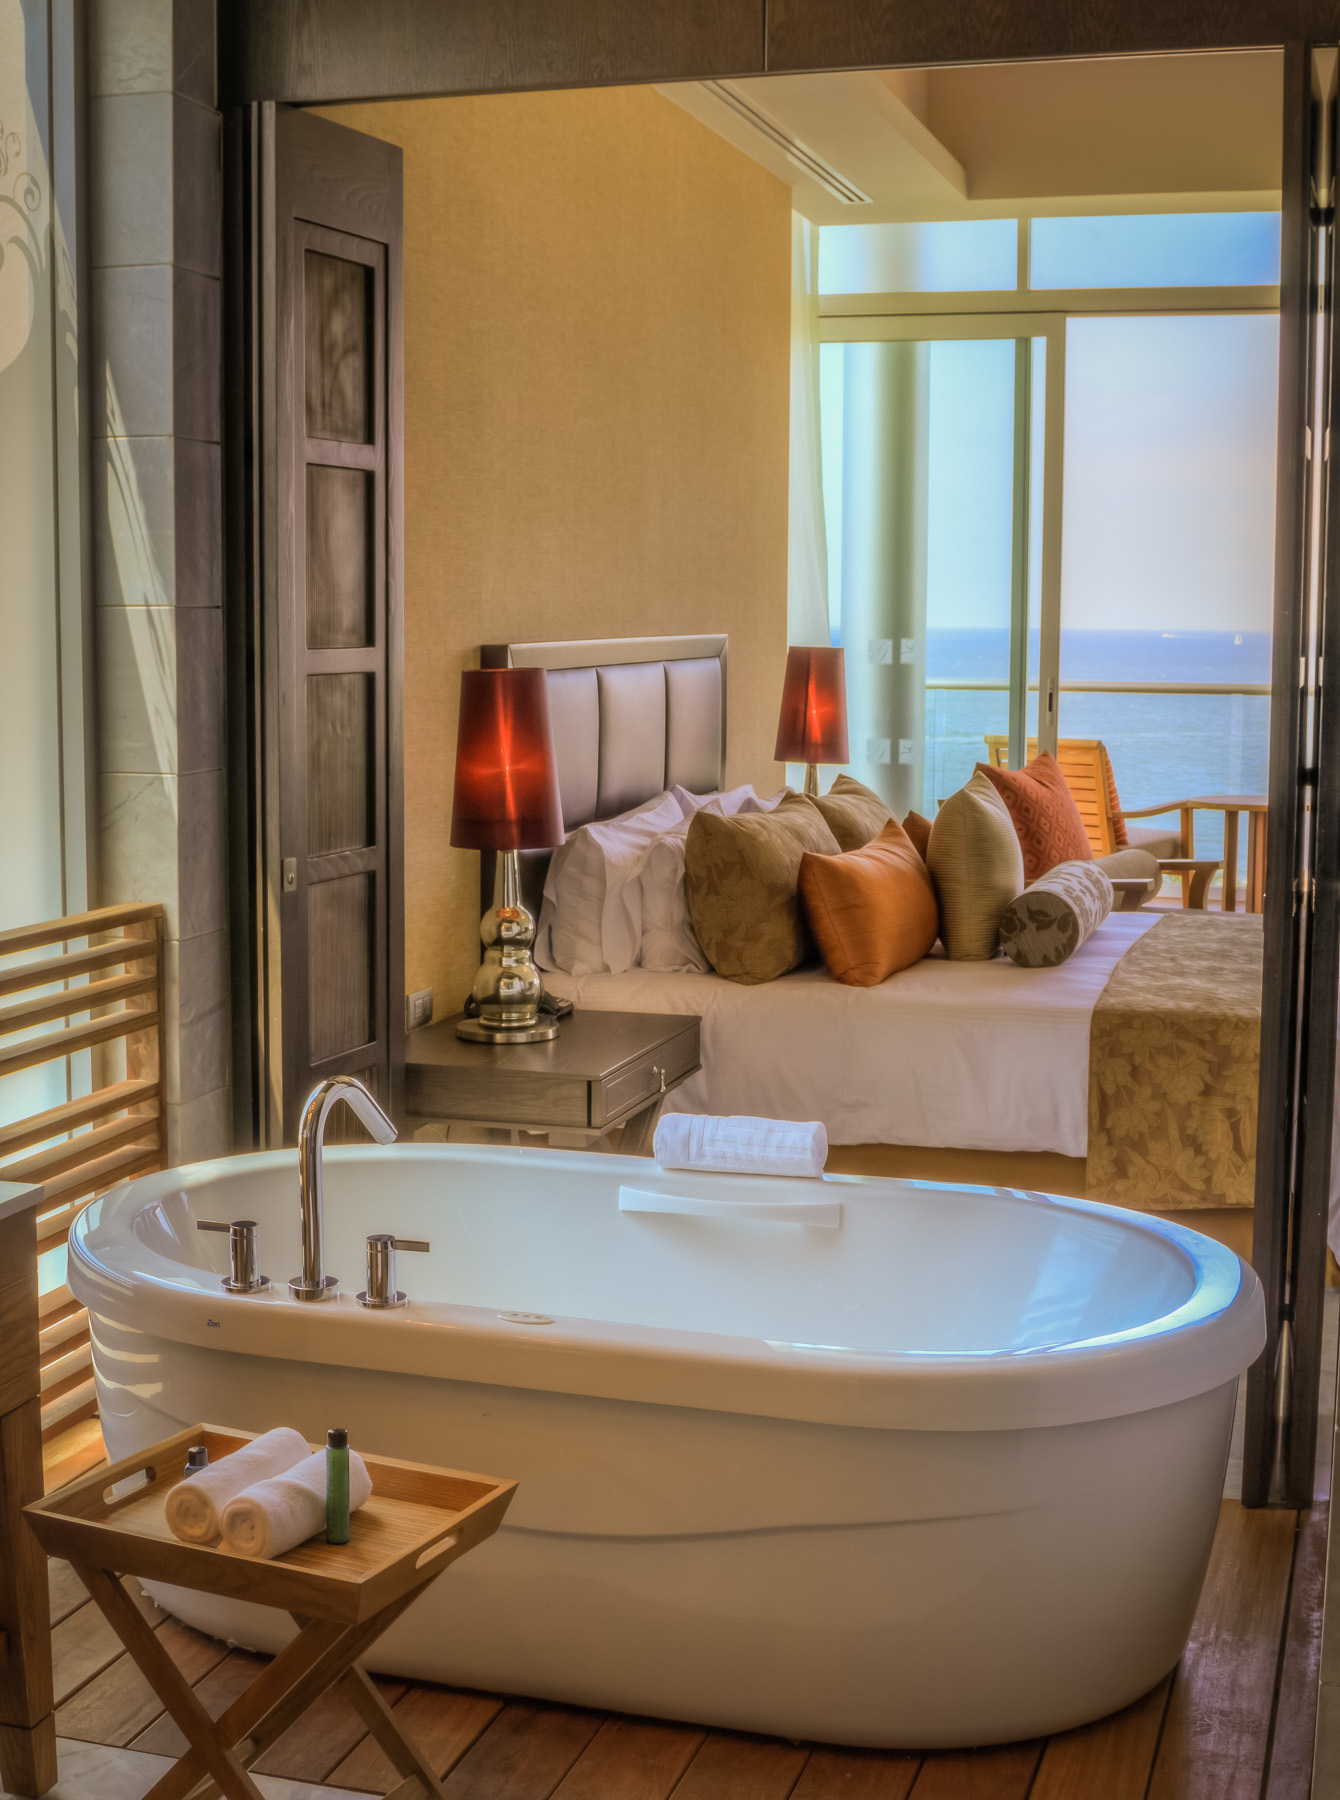 Hoteles en Riviera Nayarit